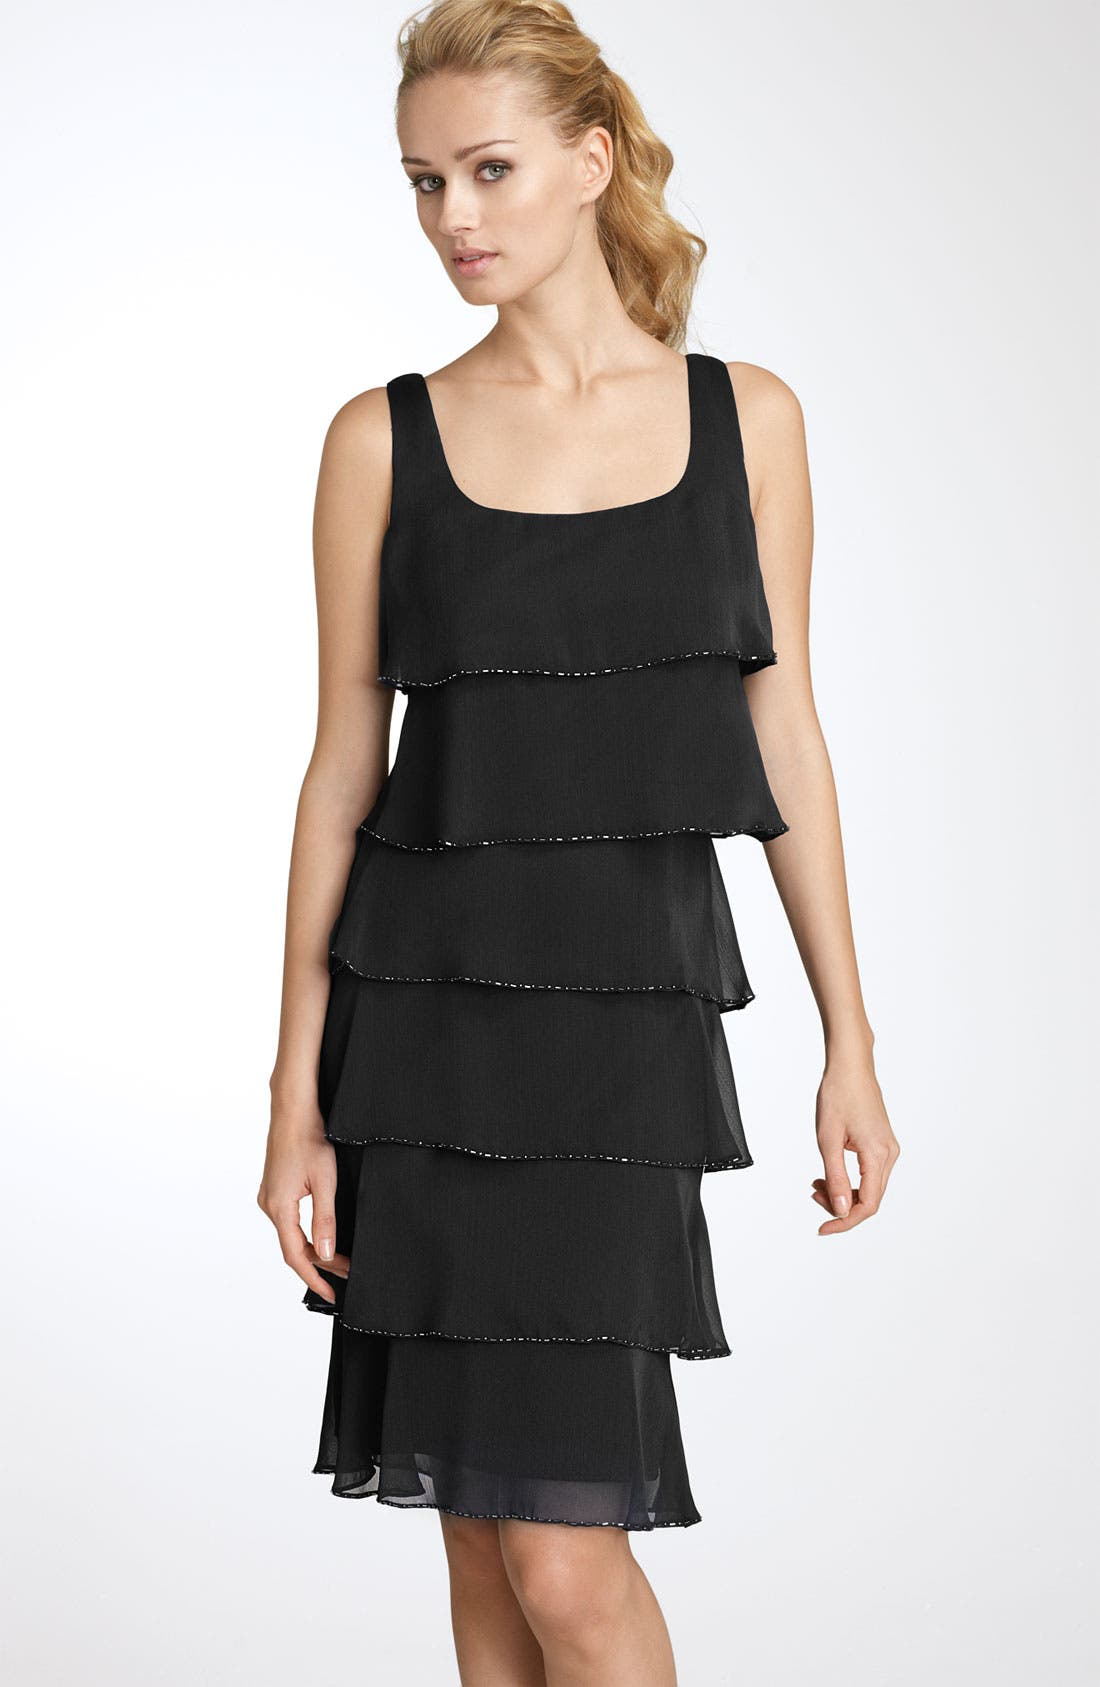 Alternate Image 1 Selected - Patra Beaded Iridescent Chiffon Dress